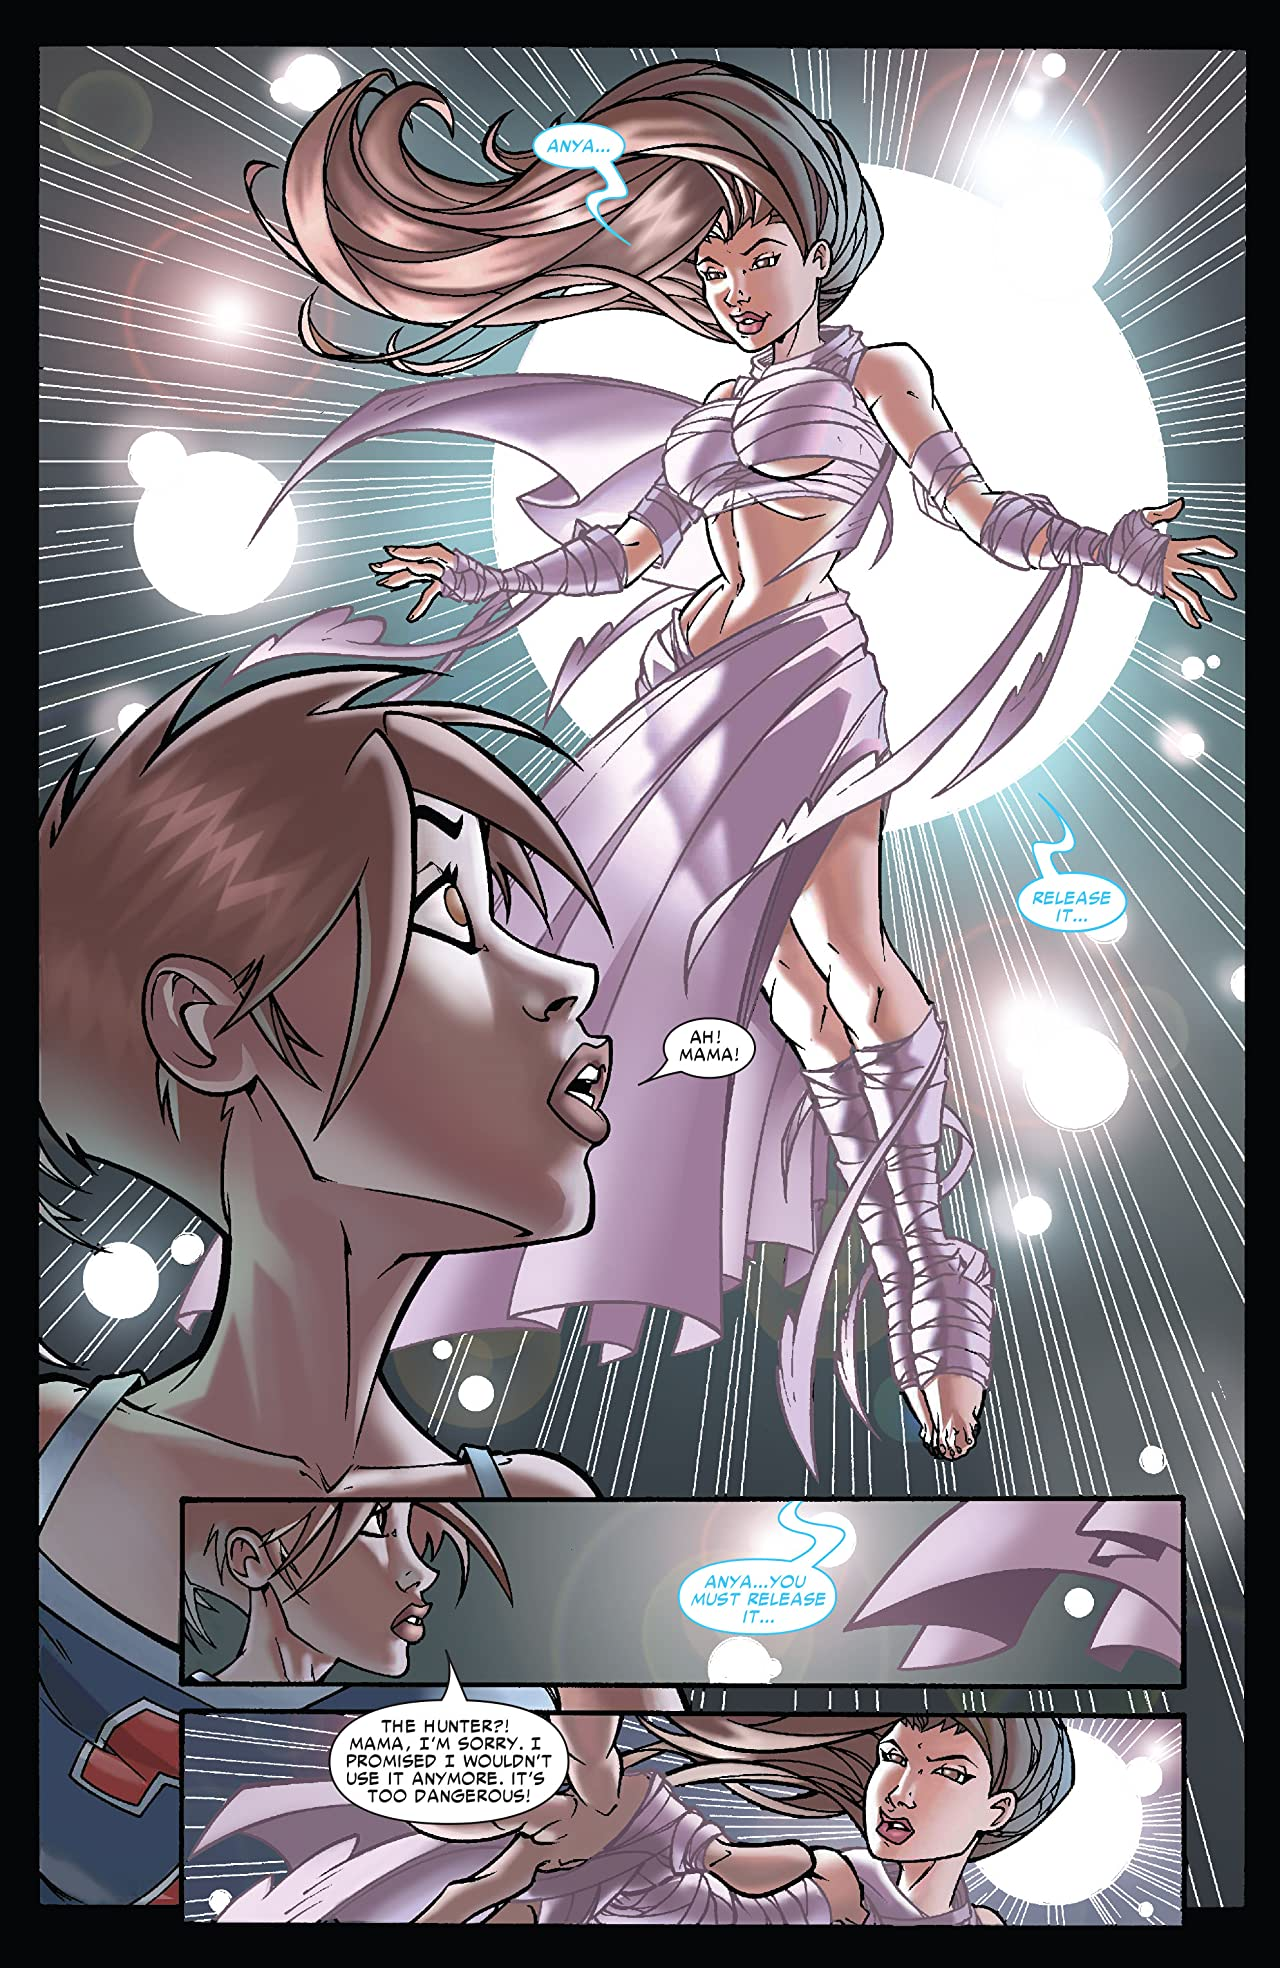 Spider-Man & Araña Special: The Hunter (2006) #1